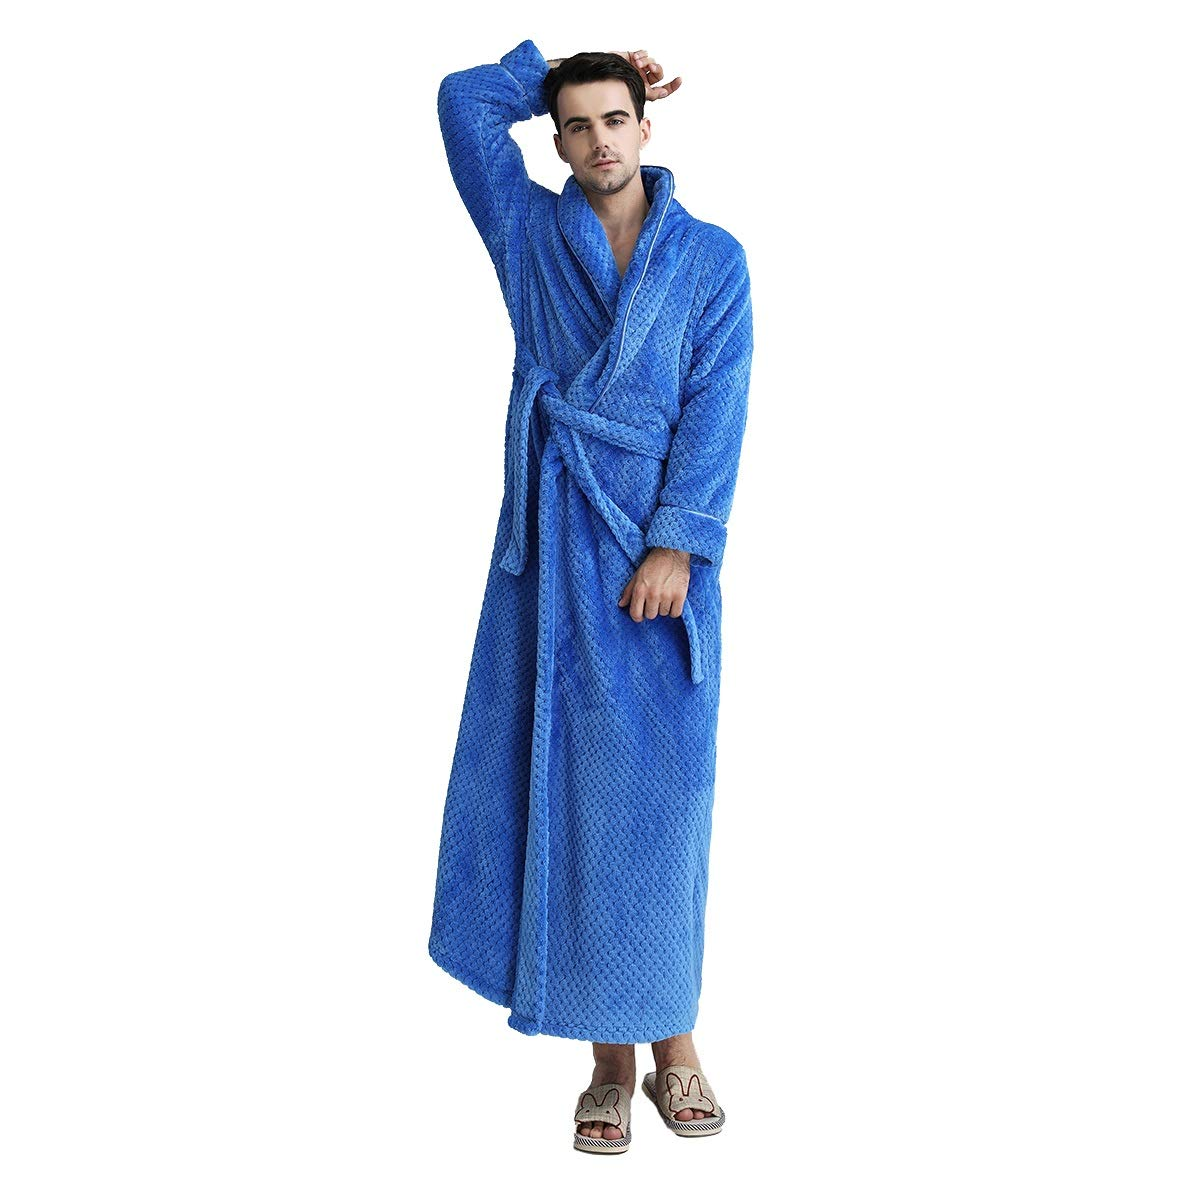 be02f0d2e5 MiaoFan Unisex Couple Flannel Dressing Gown Fluffy Long Sleeve Wrap Bathrobe  Thermal Plus Size Housecoat  Amazon.co.uk  Clothing